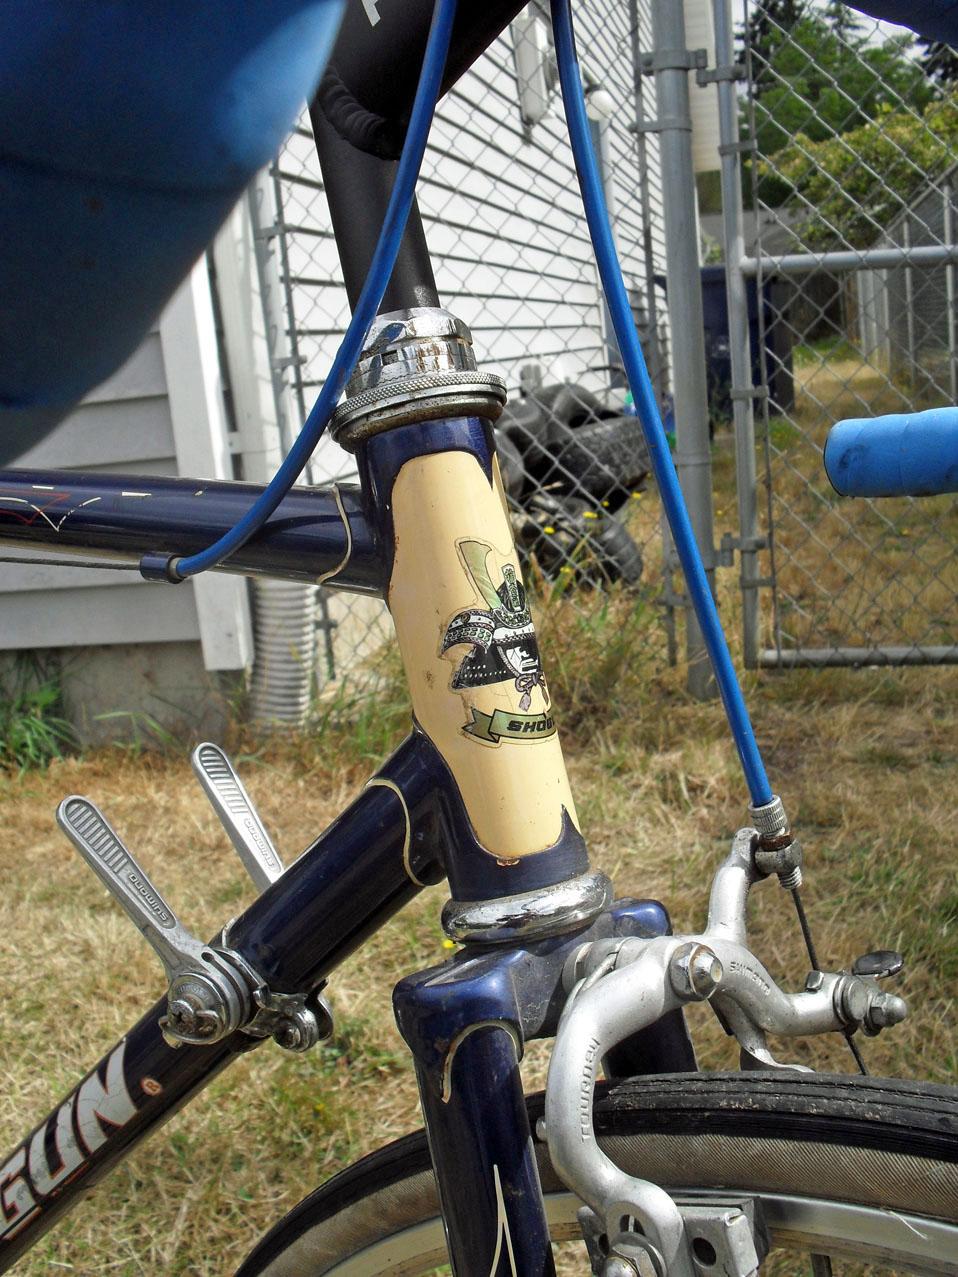 Shogun Restoration Madness Rideblog